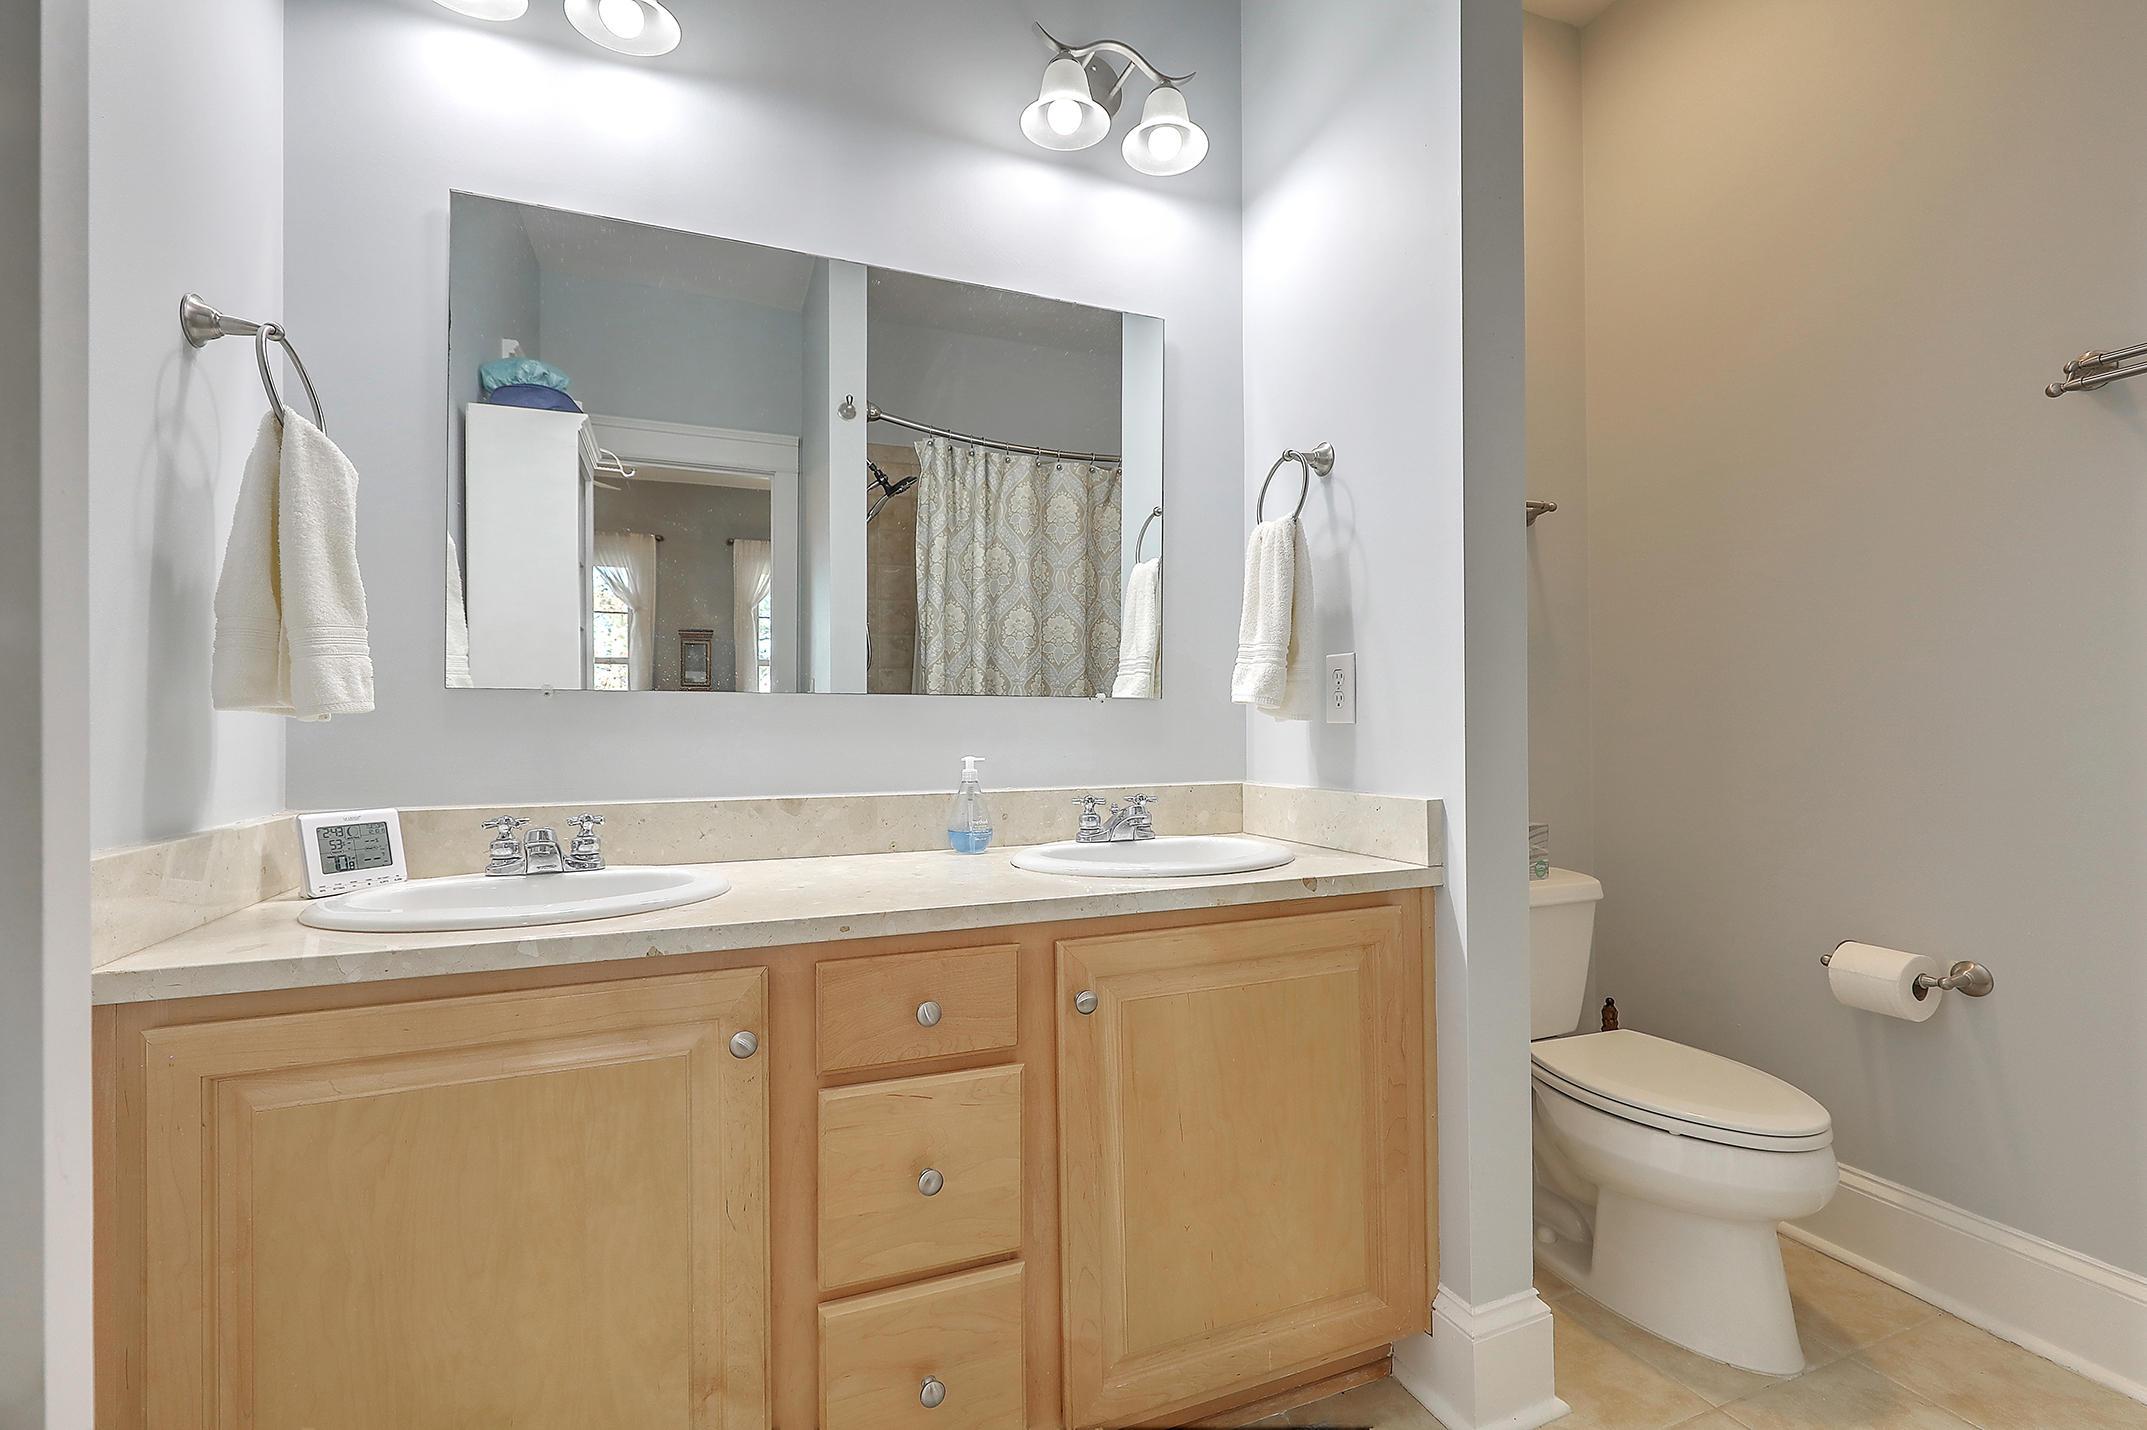 Etiwan Pointe Homes For Sale - 124 Winding Creek, Mount Pleasant, SC - 16